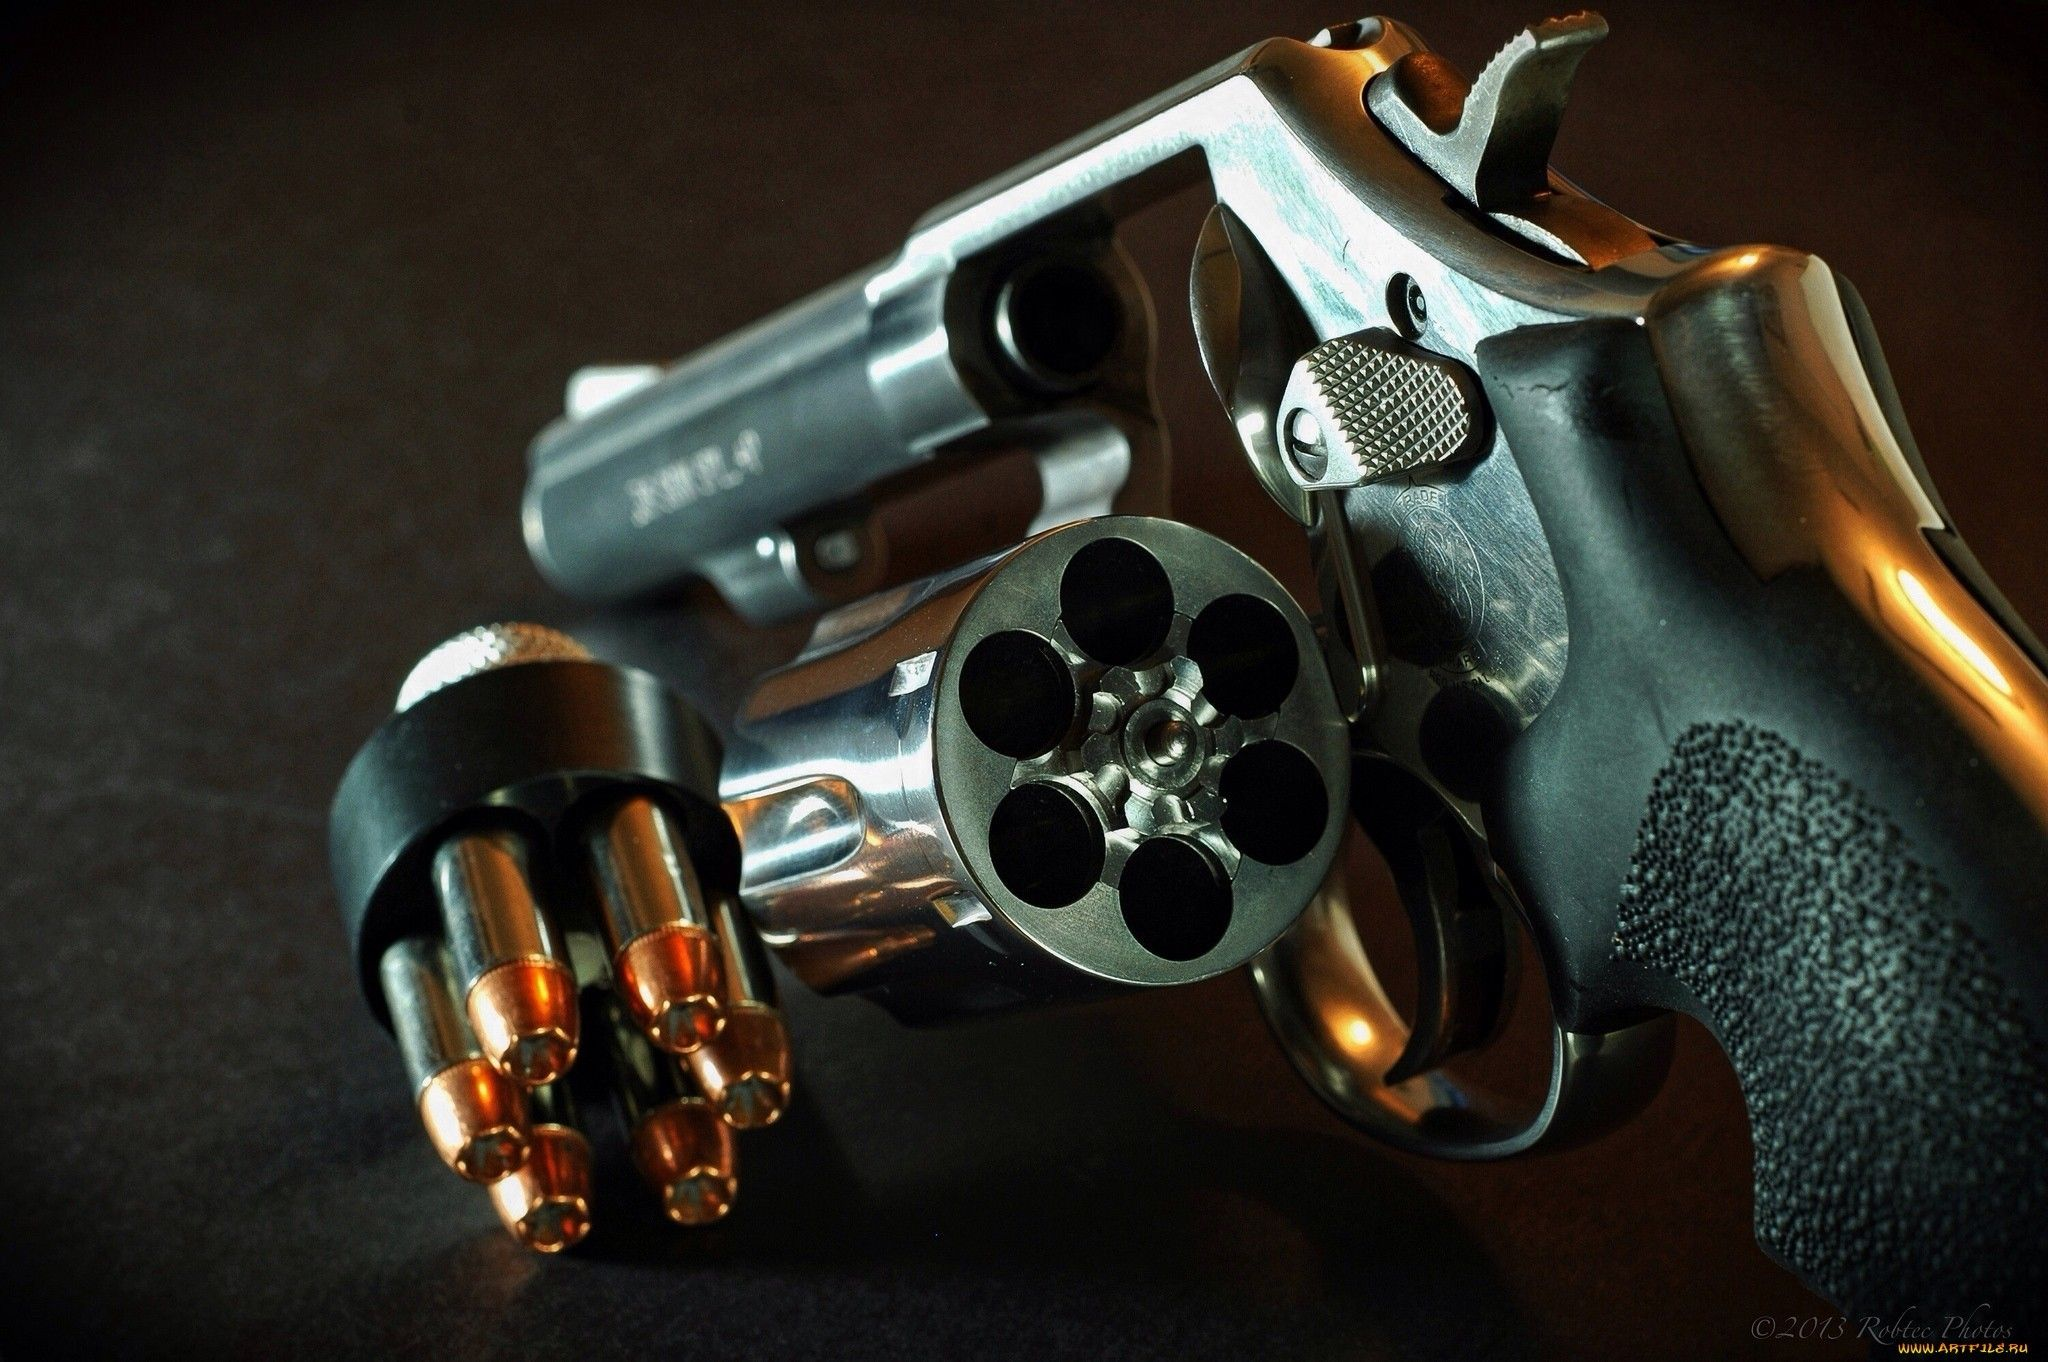 Pin On Pistol Guns and bullets hd wallpaper